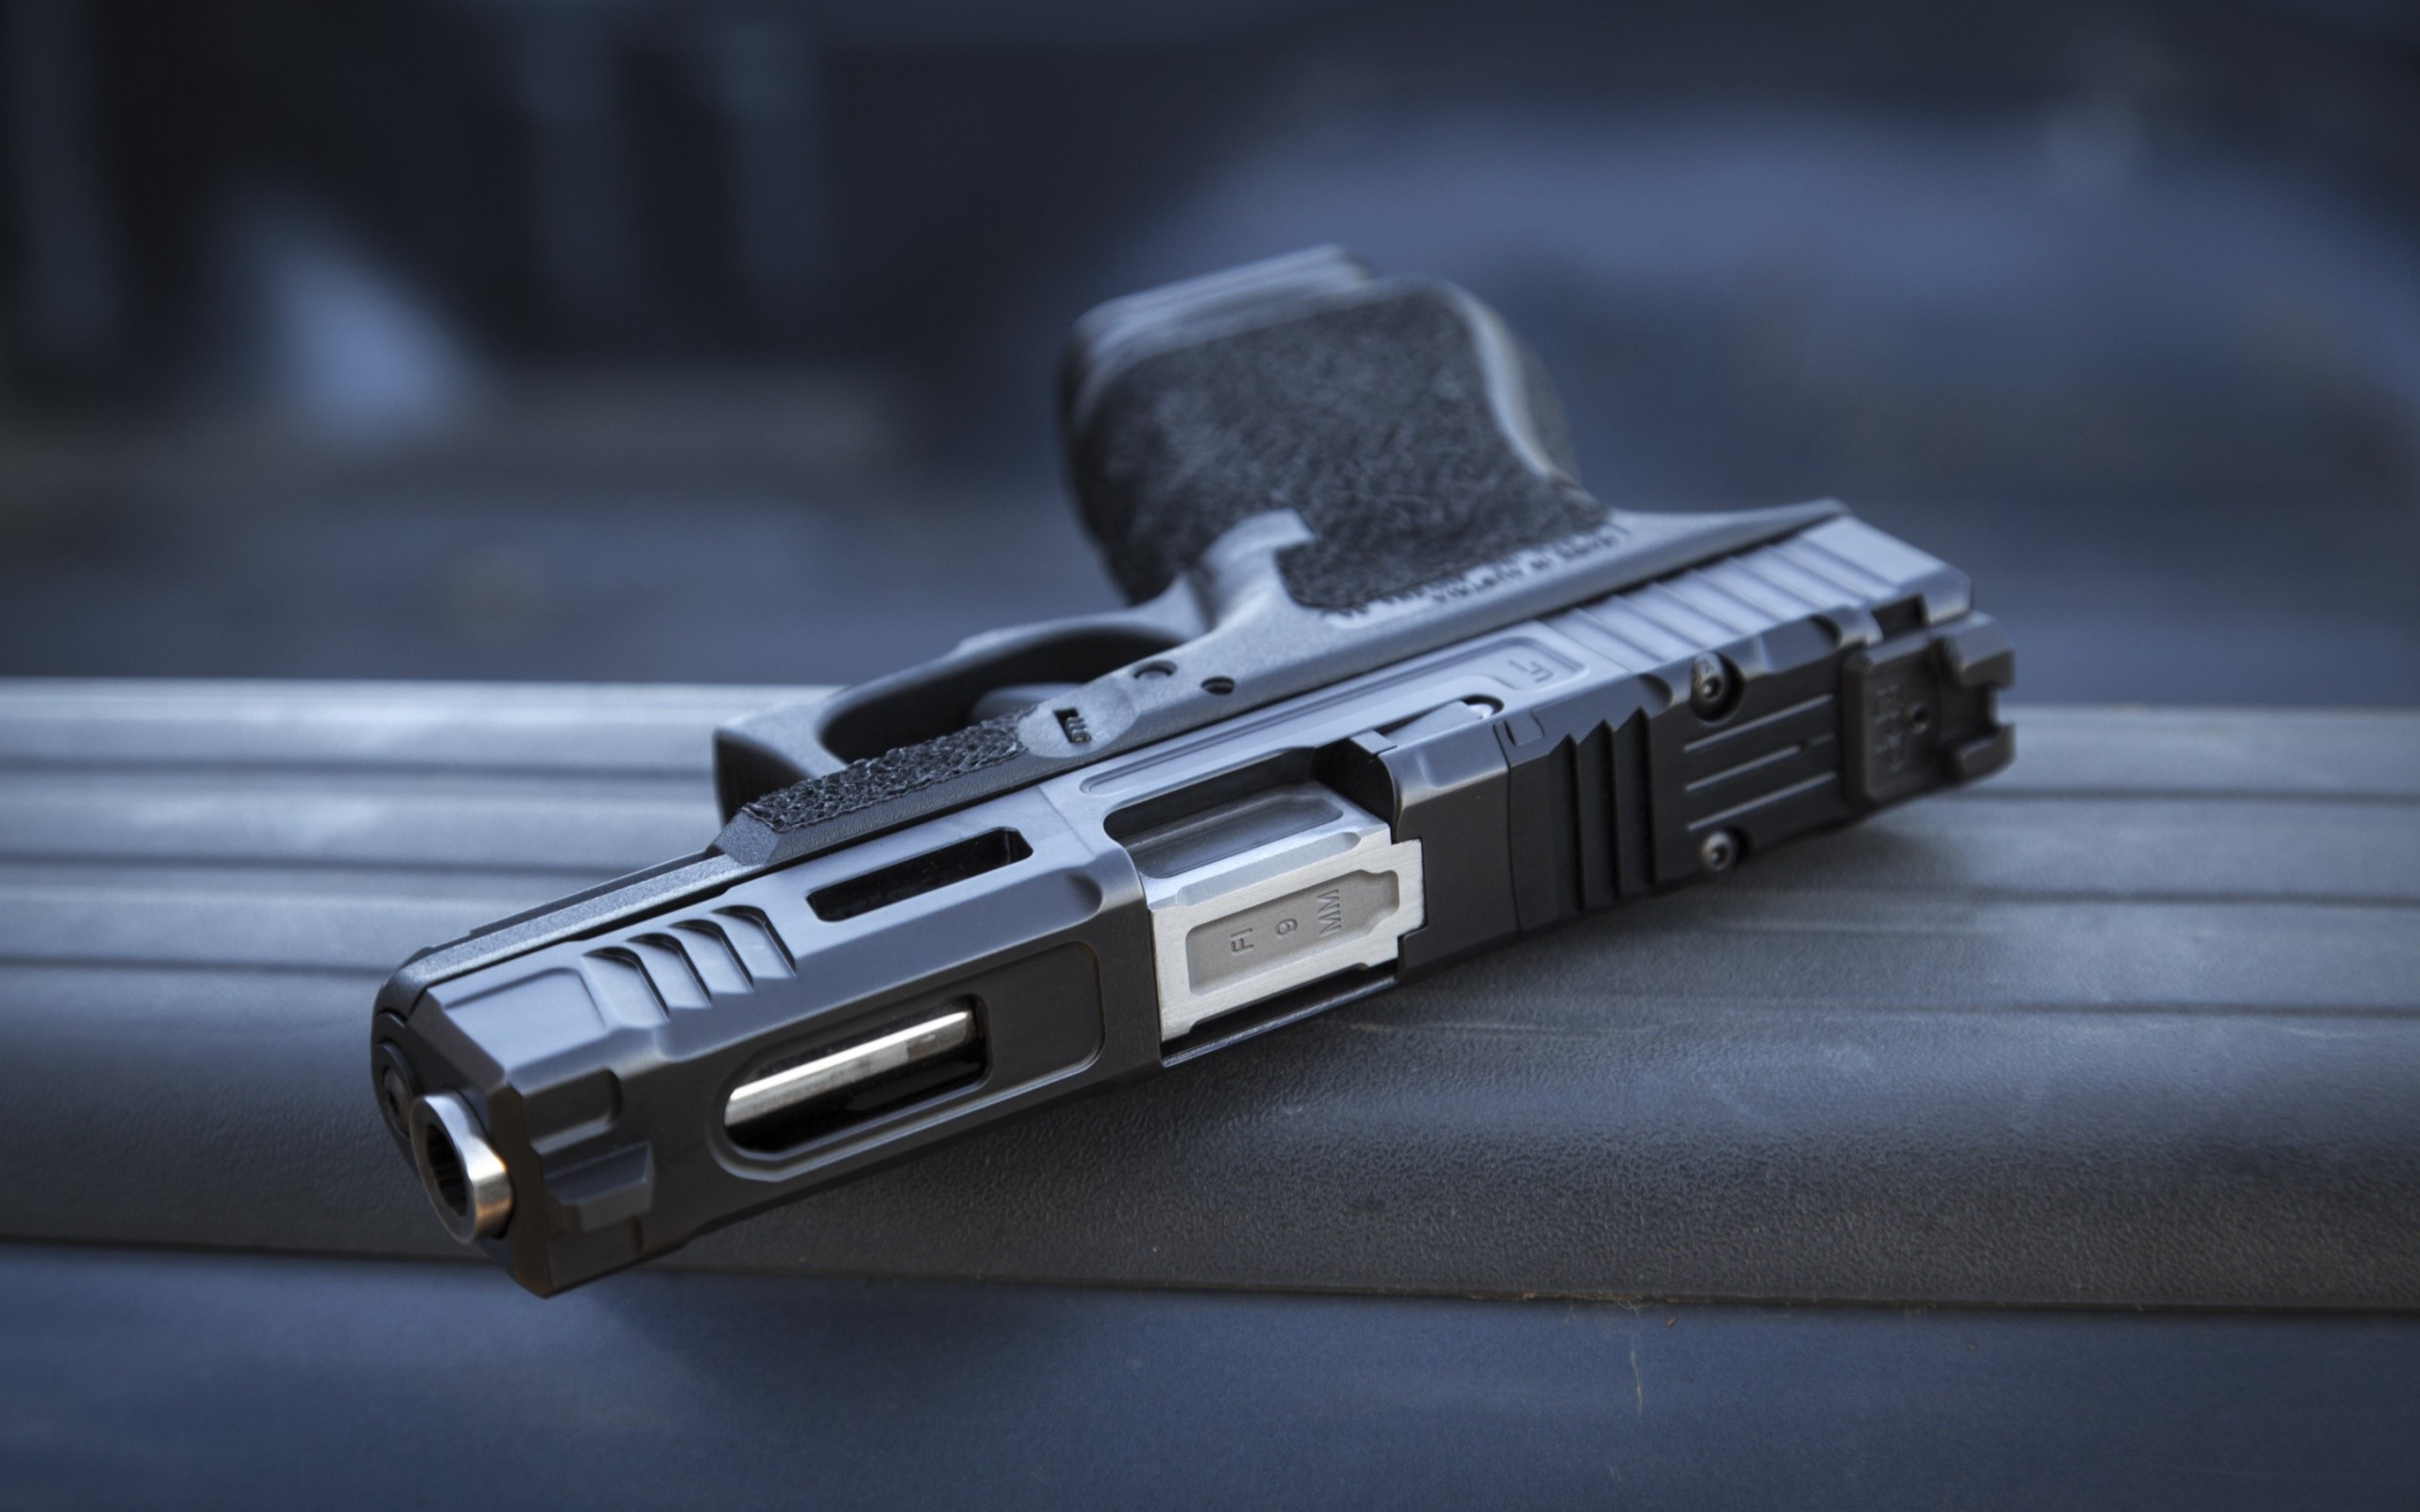 Glock 19 Semi-Automatic Gun